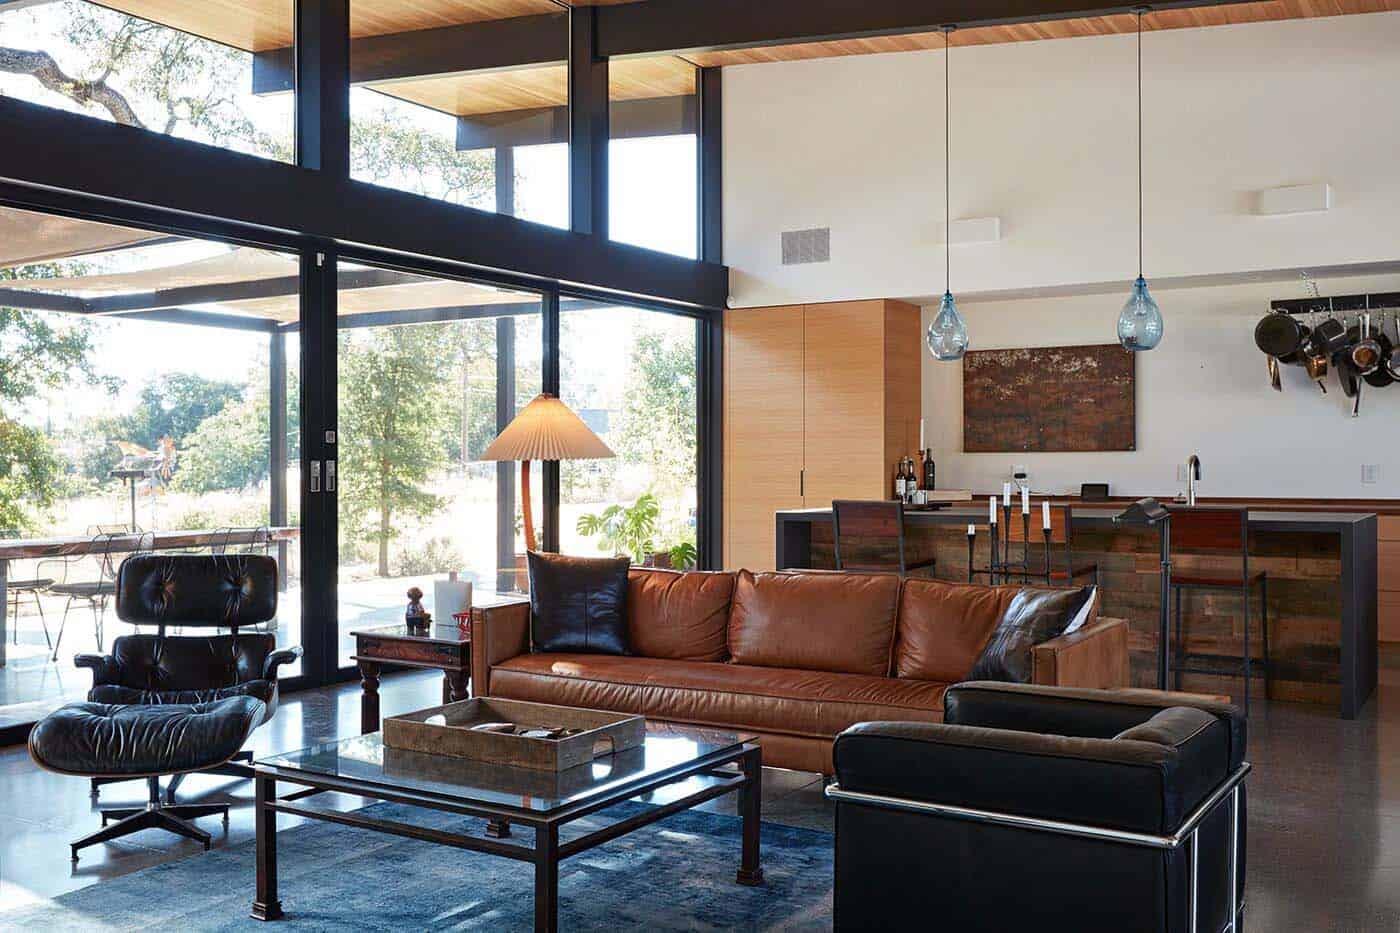 Sacramento Modern Residence-Klopf Architecture-08-1 Kindesign